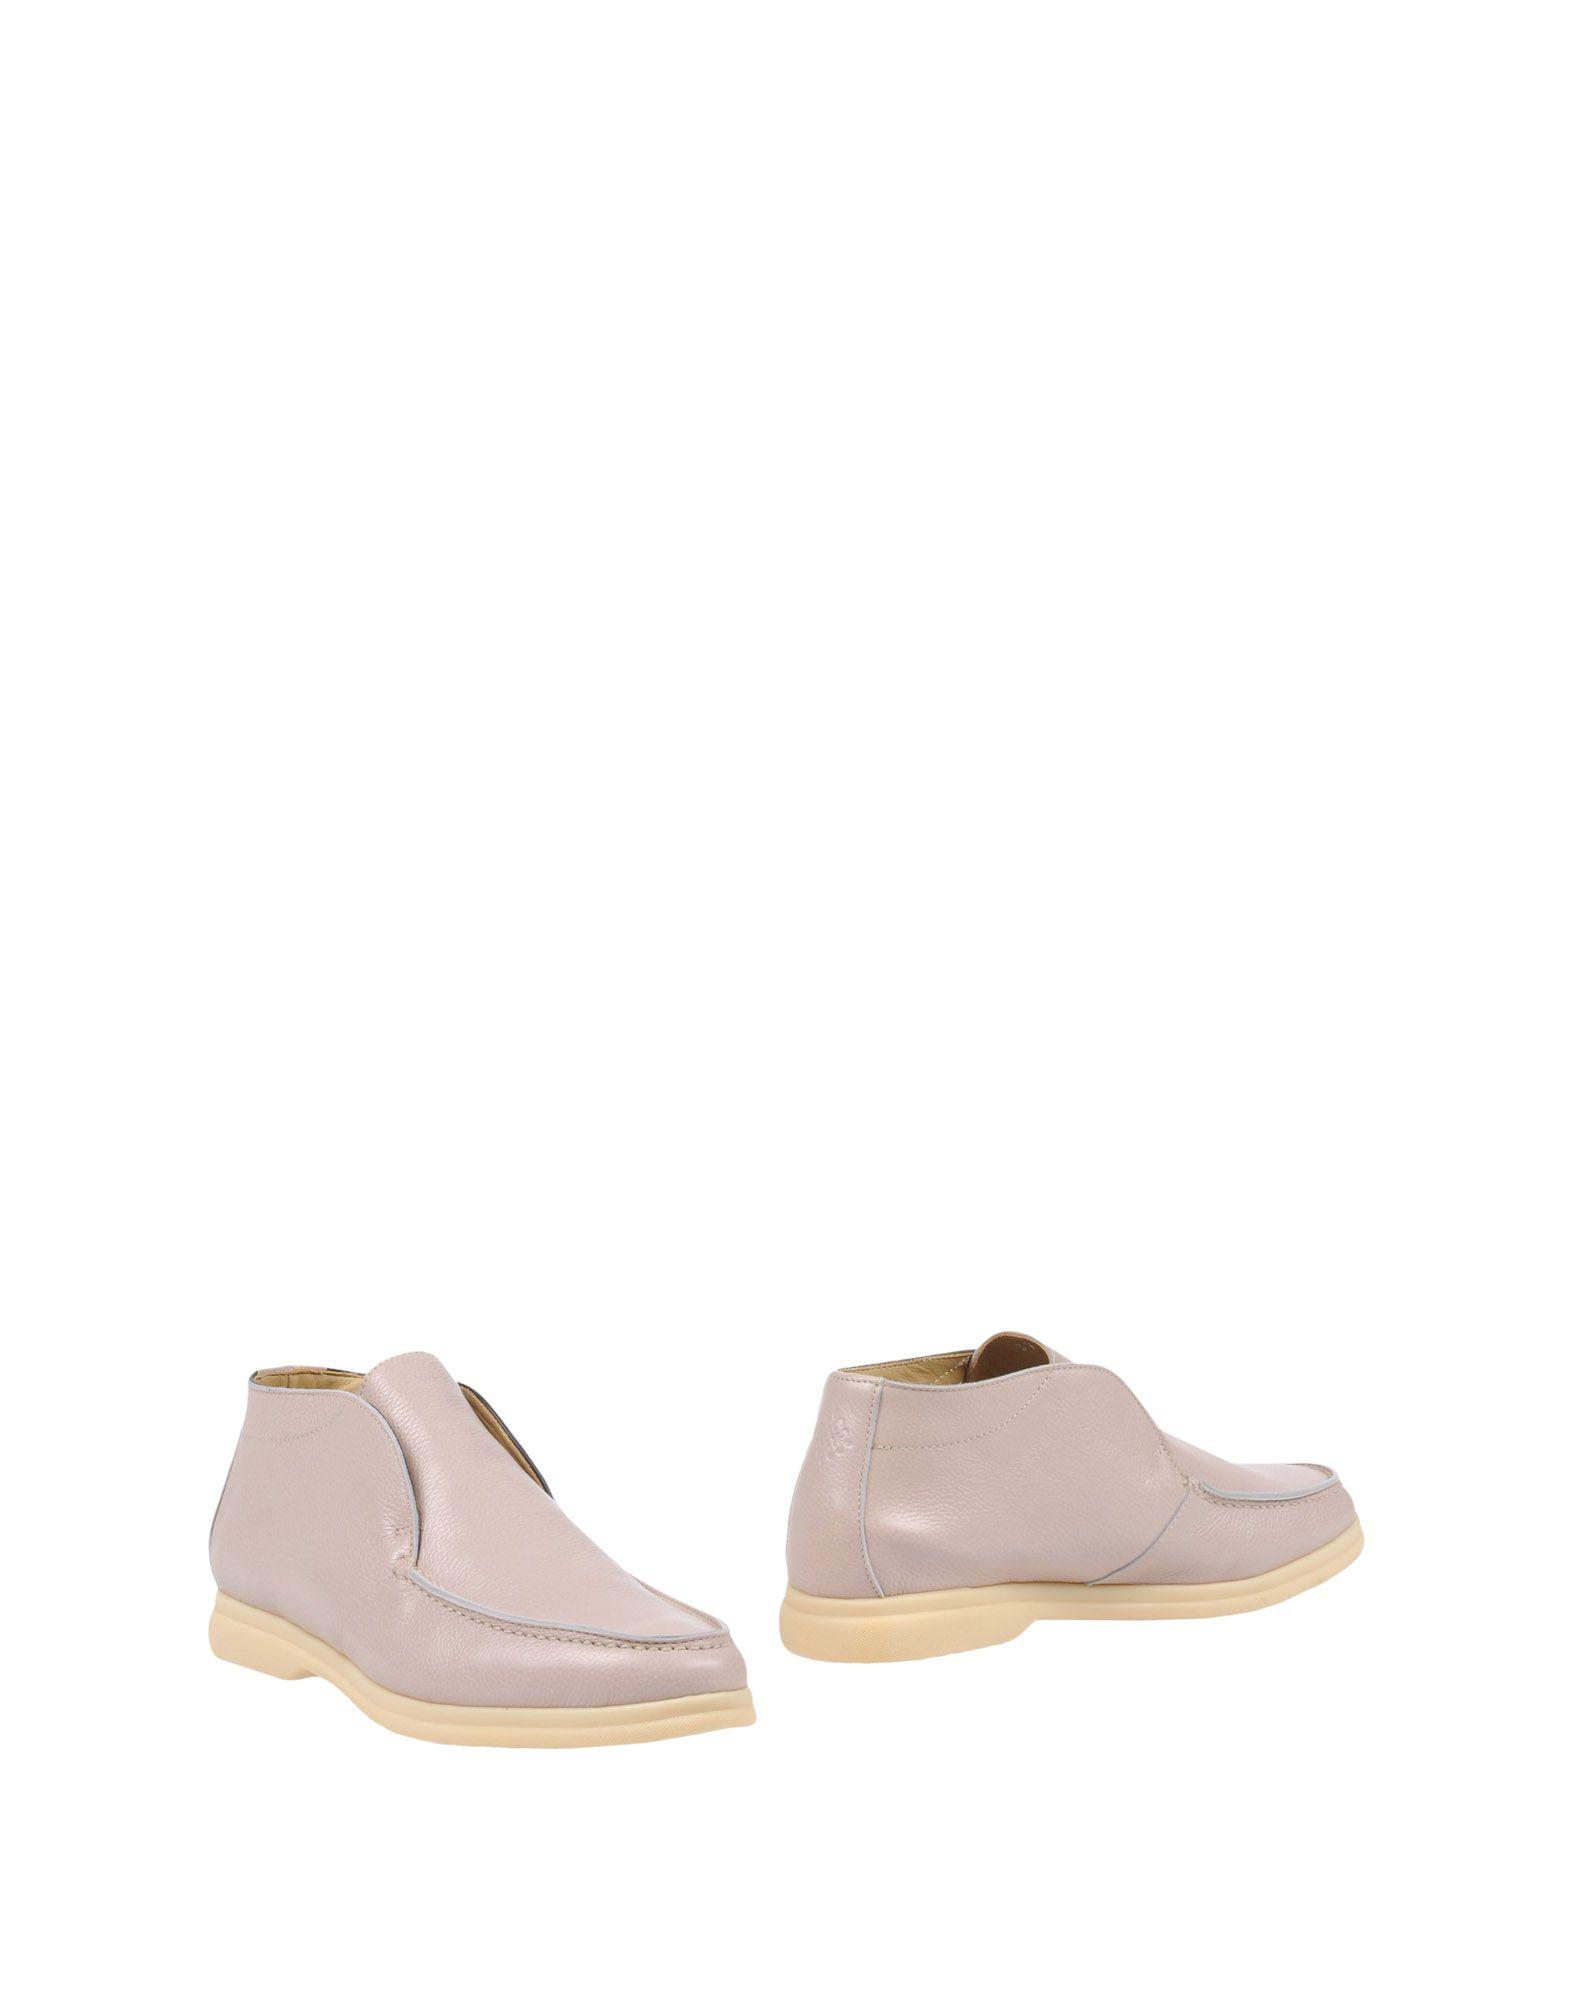 Andrea Ventura Damen Firenze Stiefelette Damen Ventura  11441721CH Neue Schuhe bbf1ba